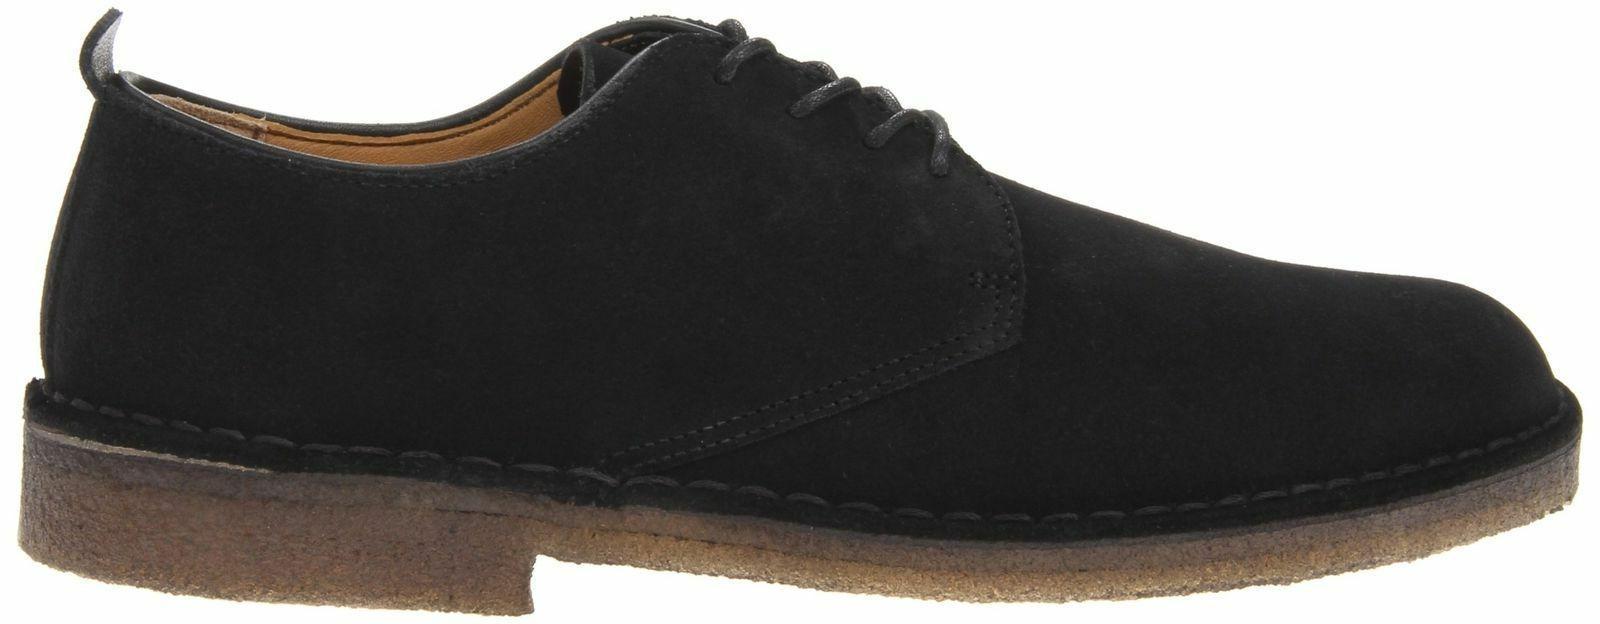 London Oxford Shoes